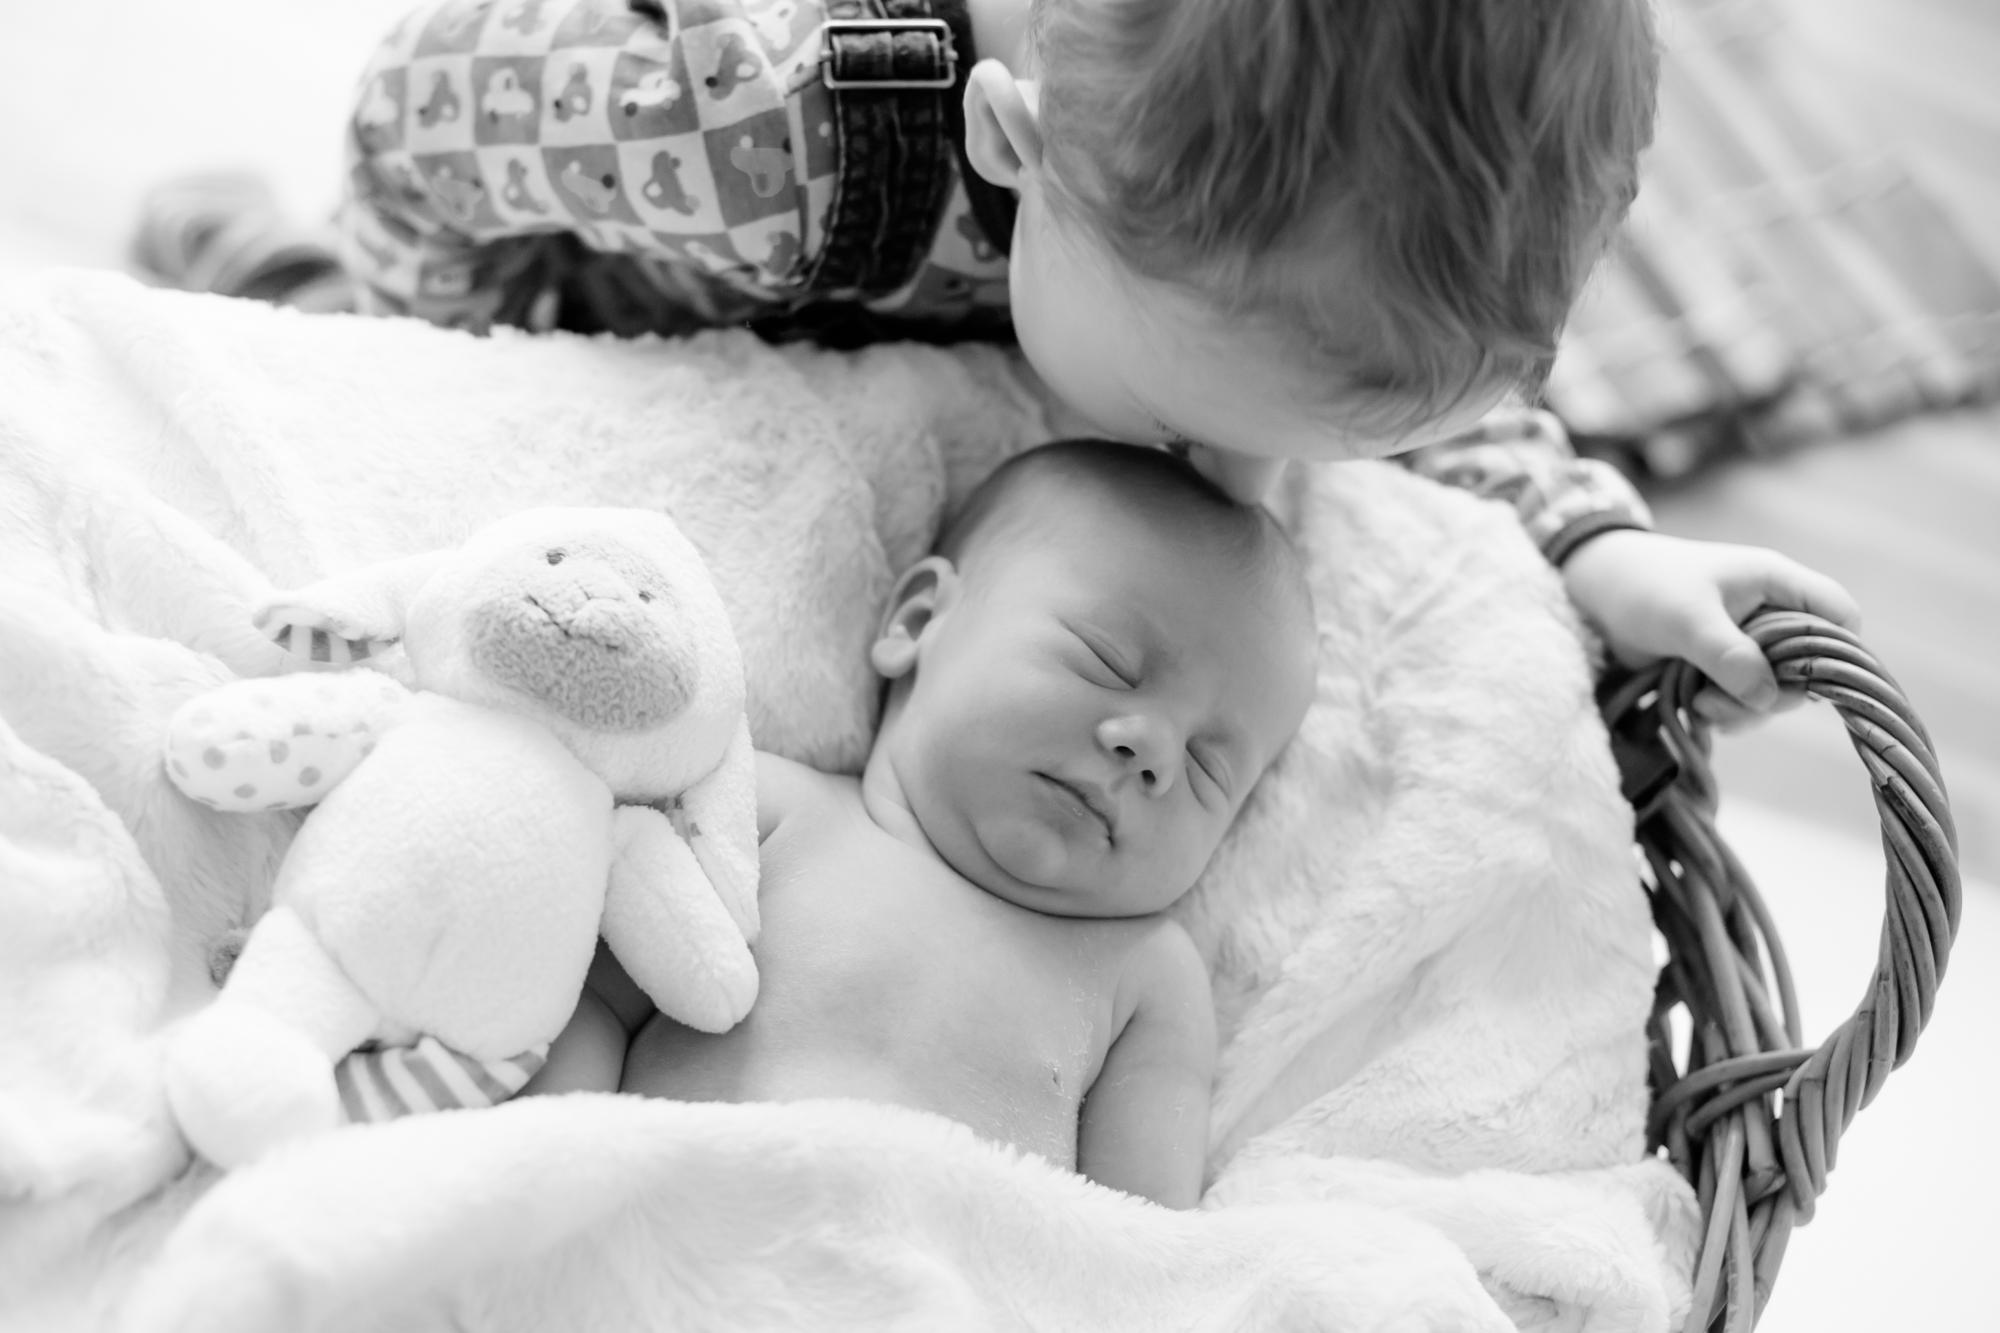 Fotografer din baby_kursbilder_søsken-9.jpg